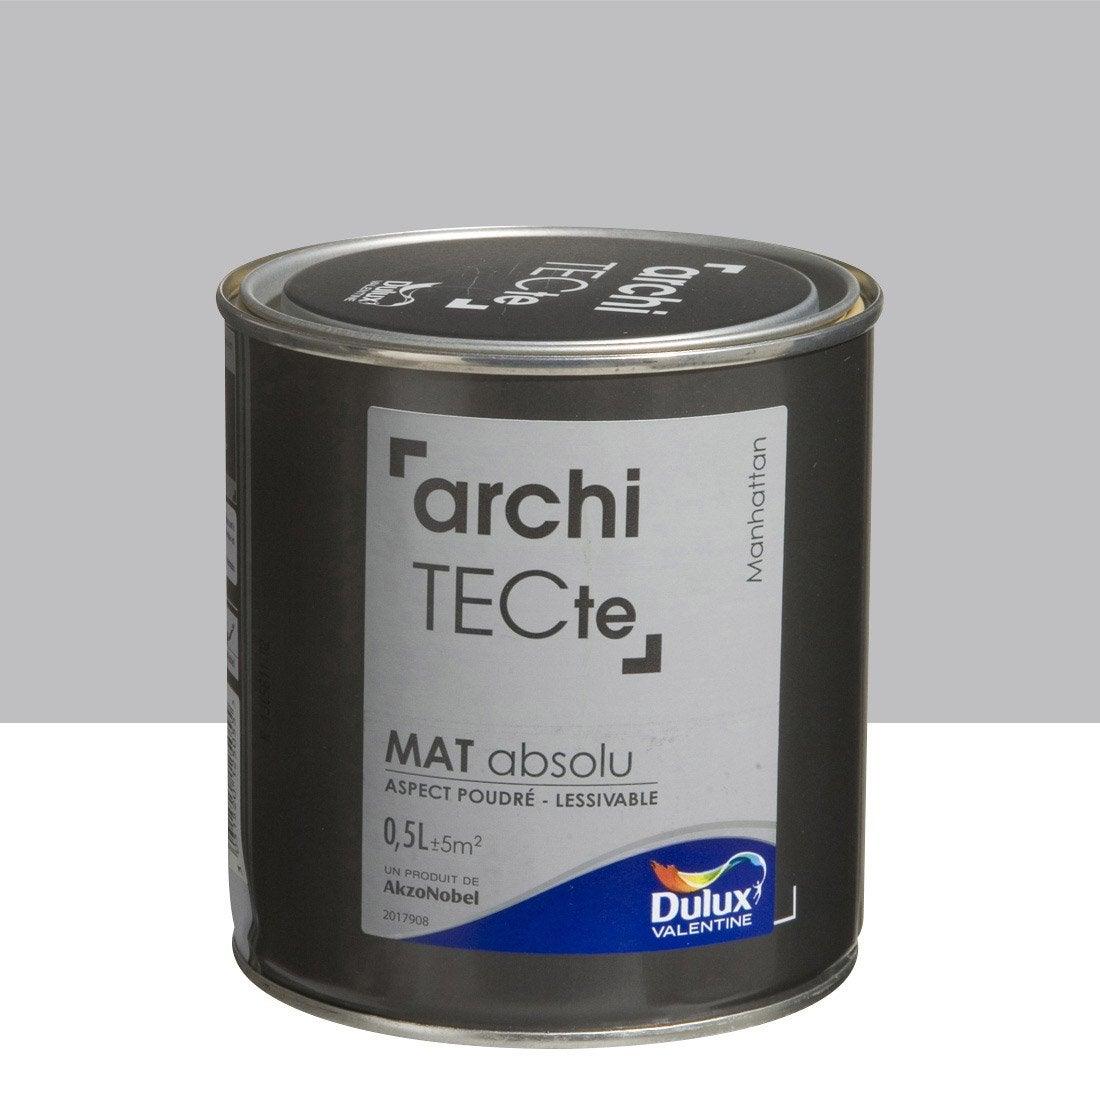 Peinture gris manhattan dulux valentine architecte 0 5 l for Peinture architecte leroy merlin